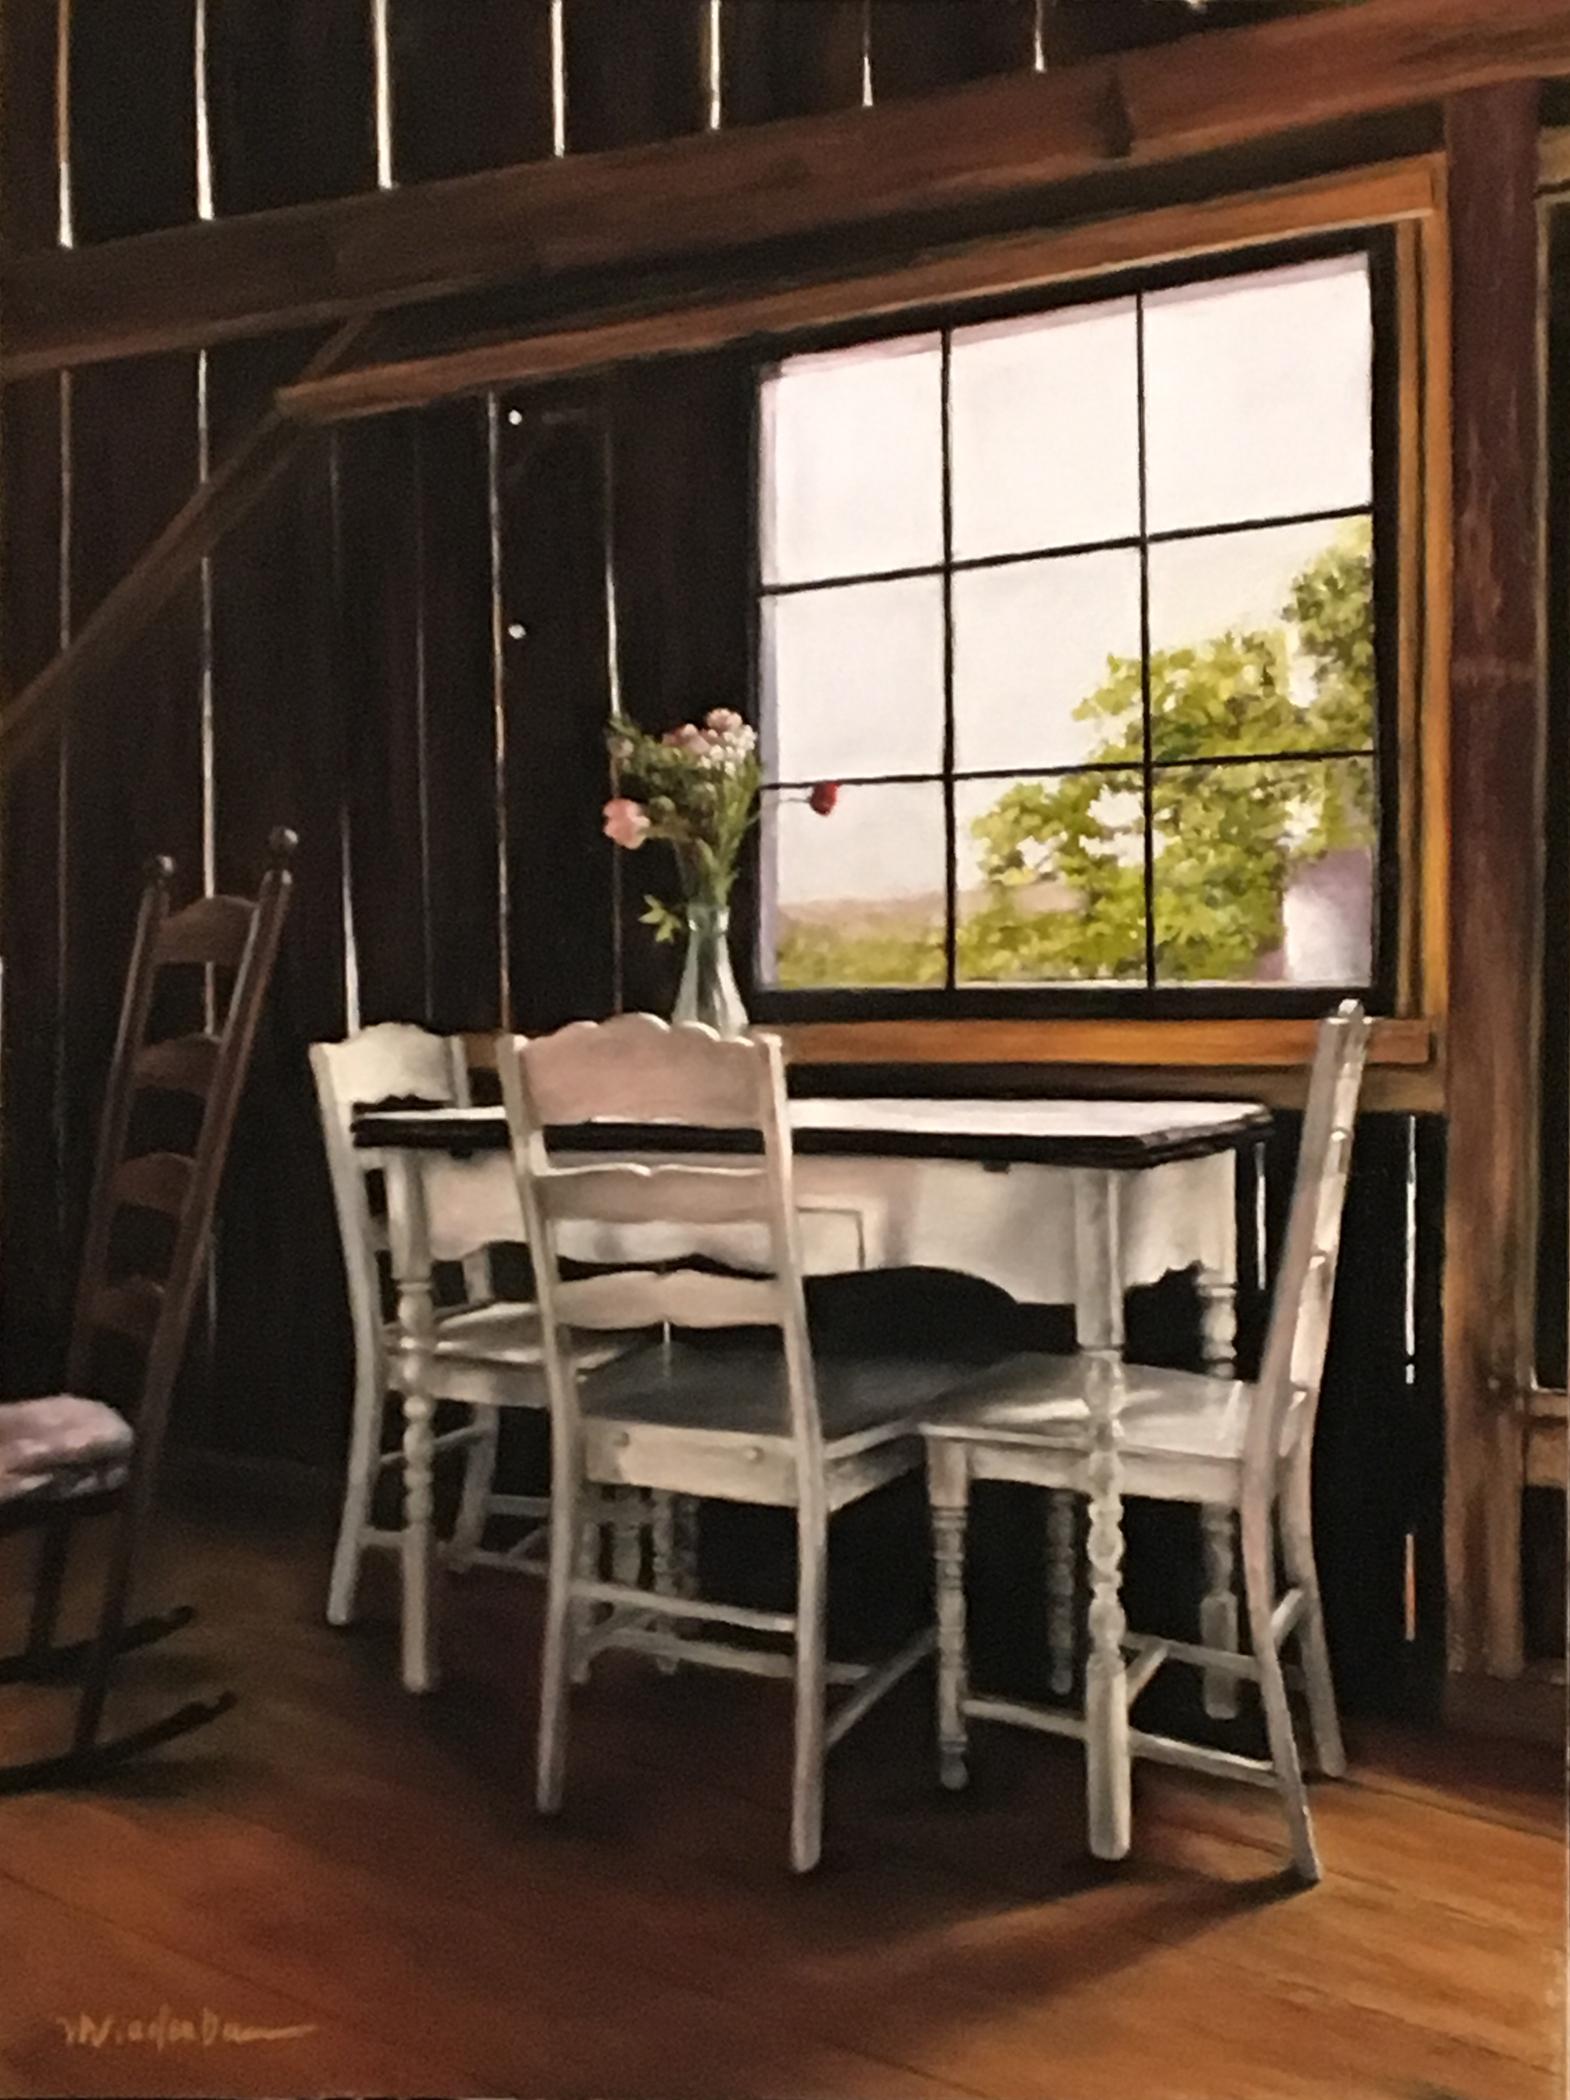 Interiors 1, Elaine's Table